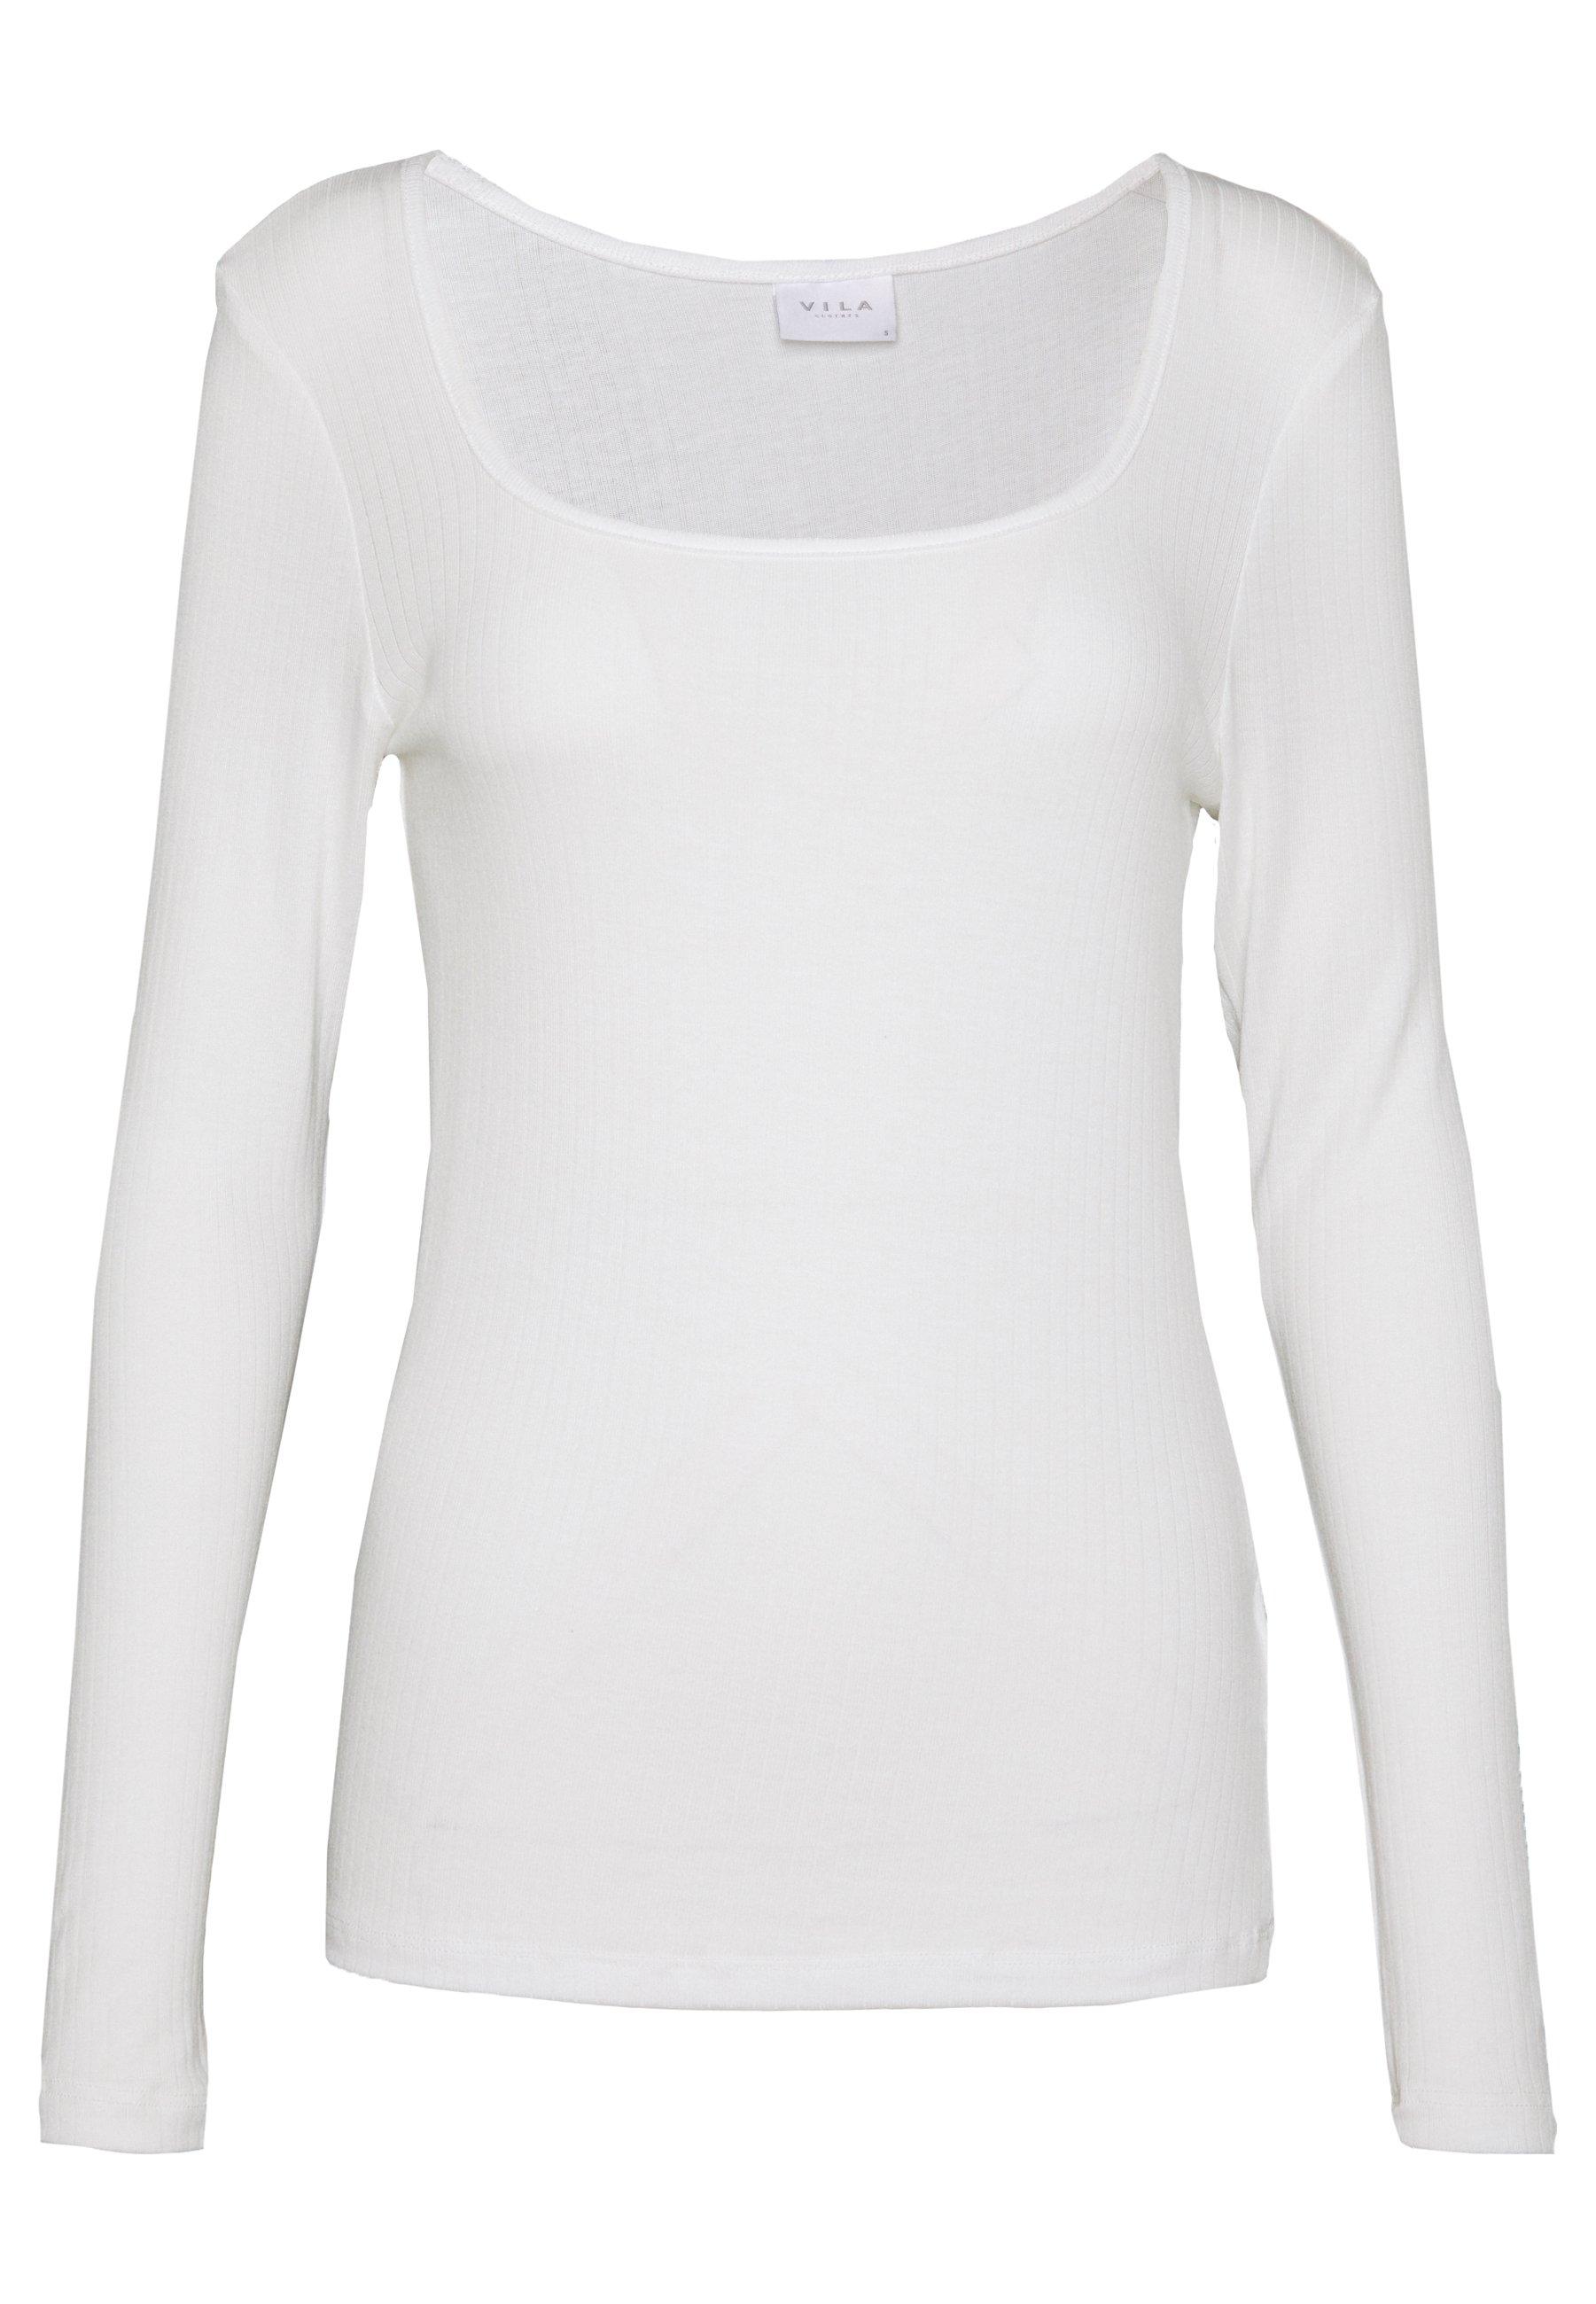 Vila Visuloma - Long Sleeved Top White Alyssum